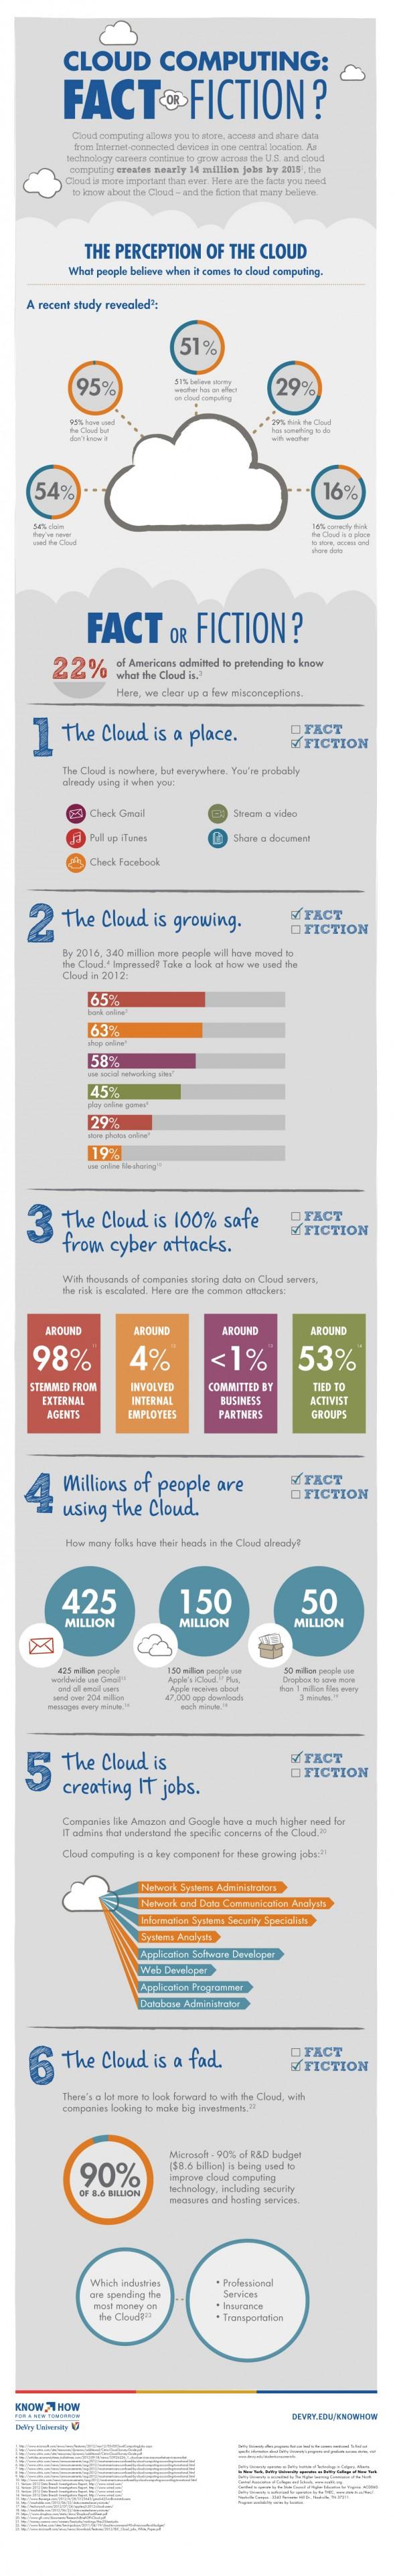 Cloud Computing - Fact or Fiction